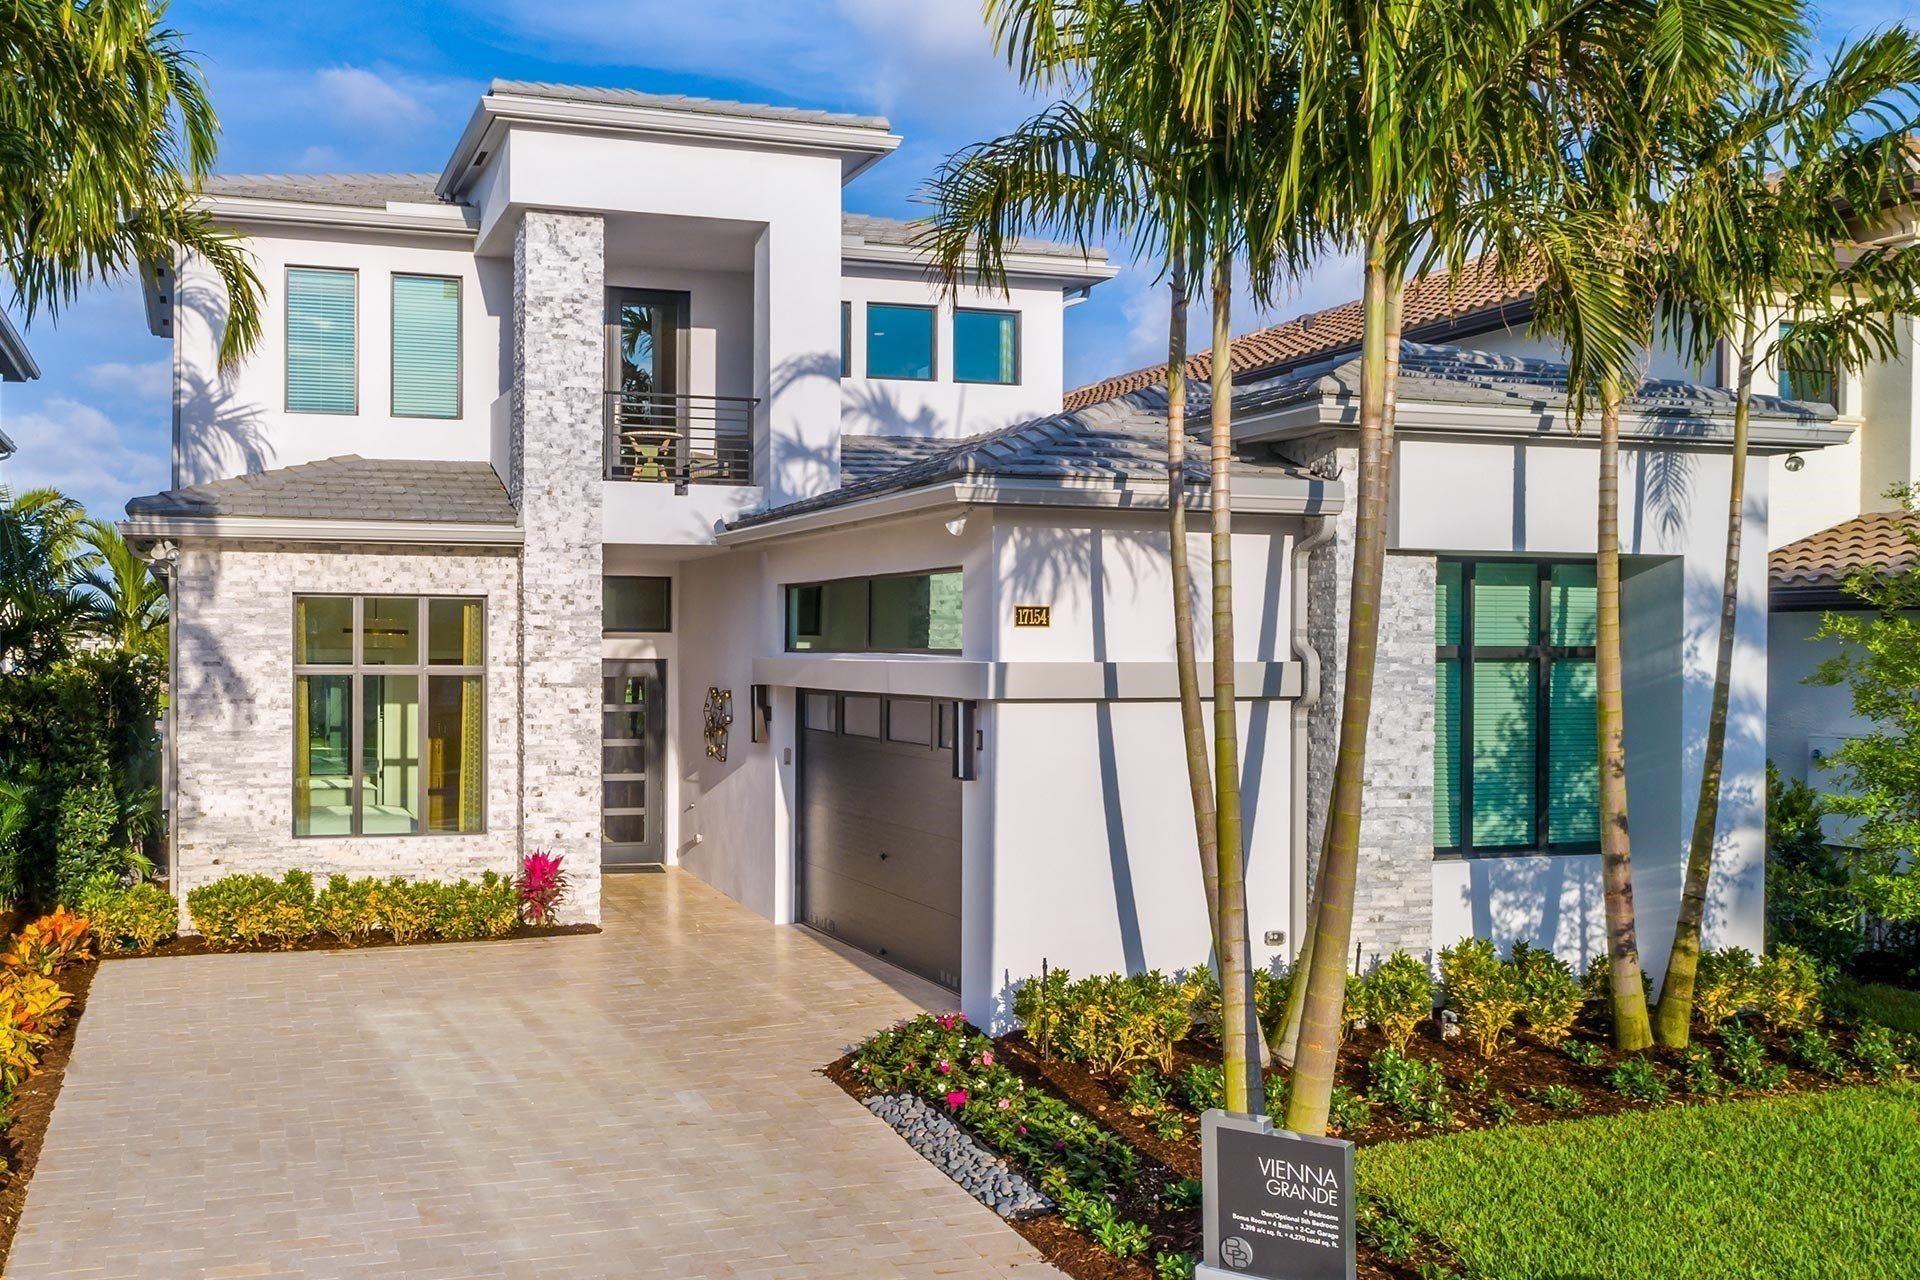 9009 Chauvet Way, Boca Raton, FL 33496 - #: RX-10586412